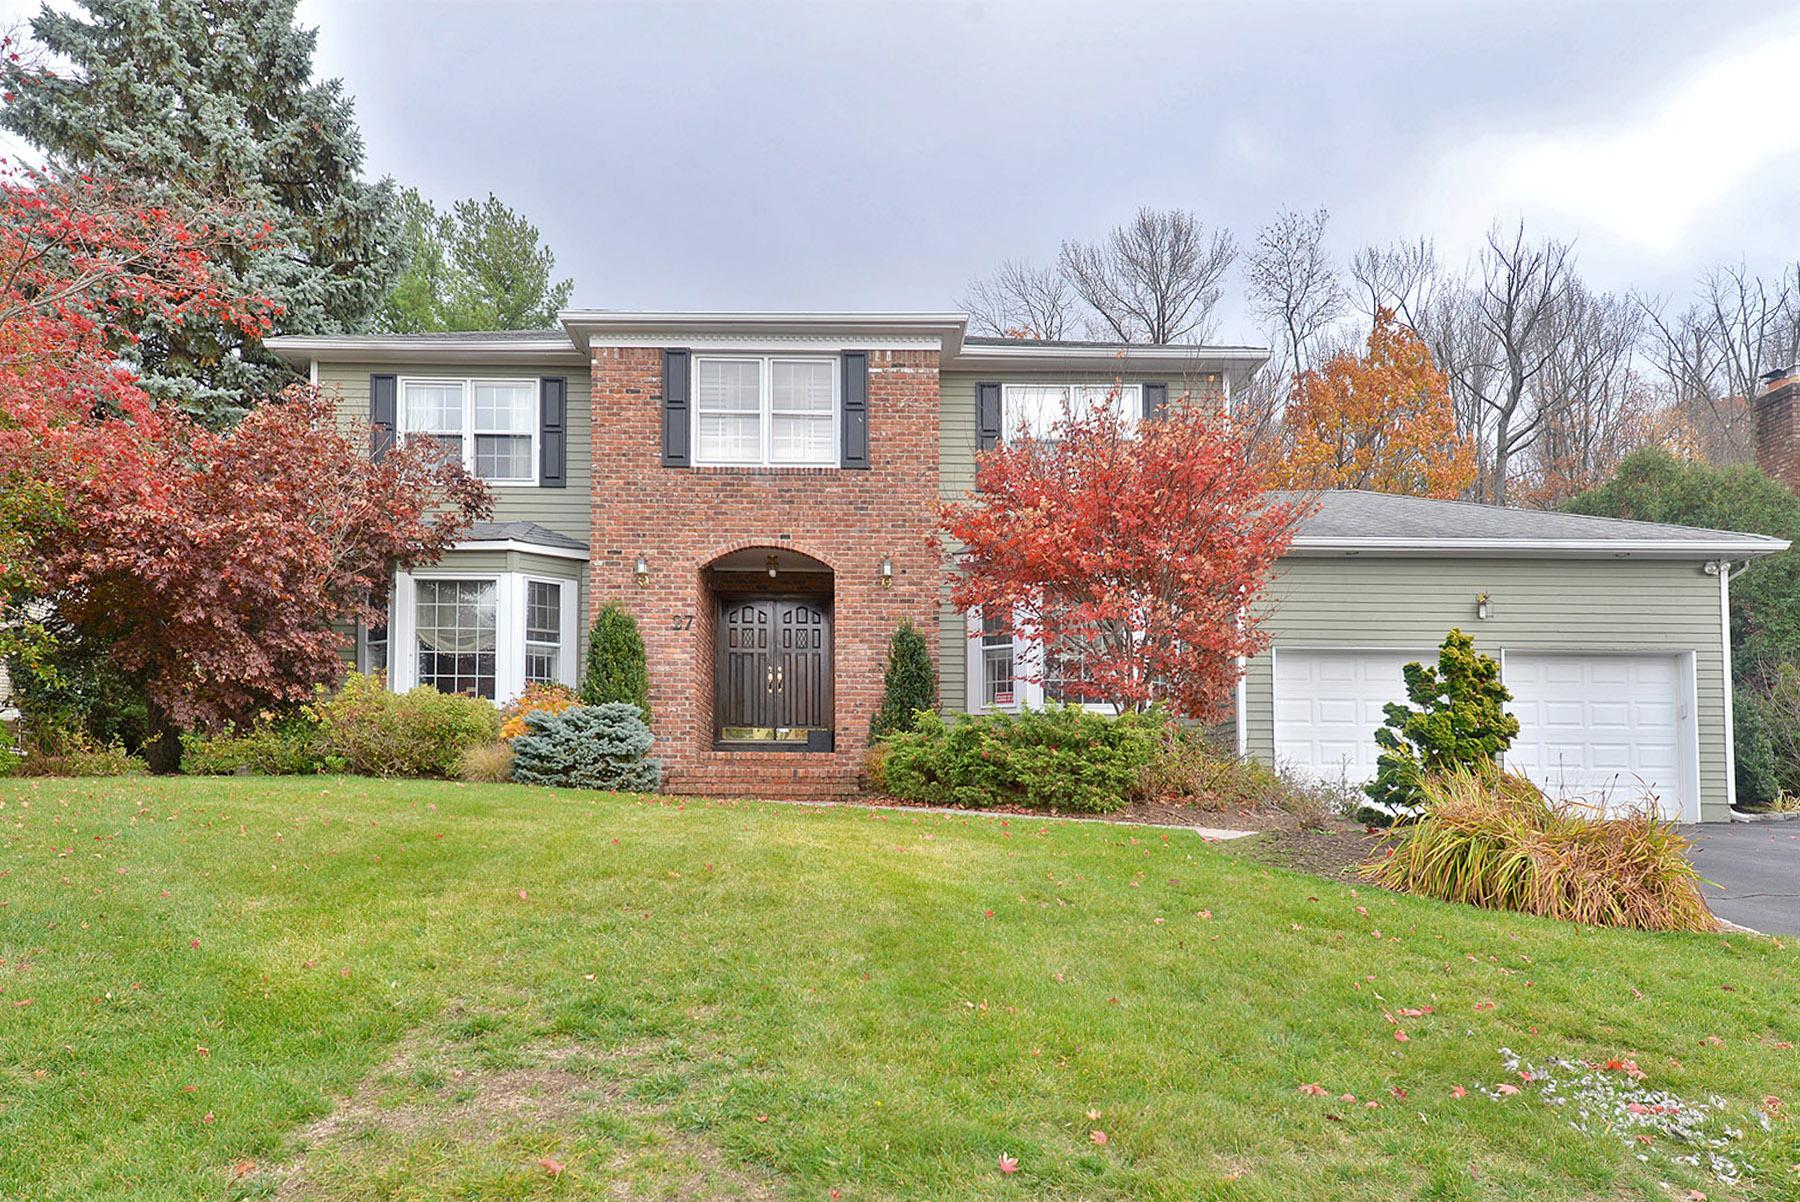 27 Windridge Dr., North Caldwell, New Jersey 07006